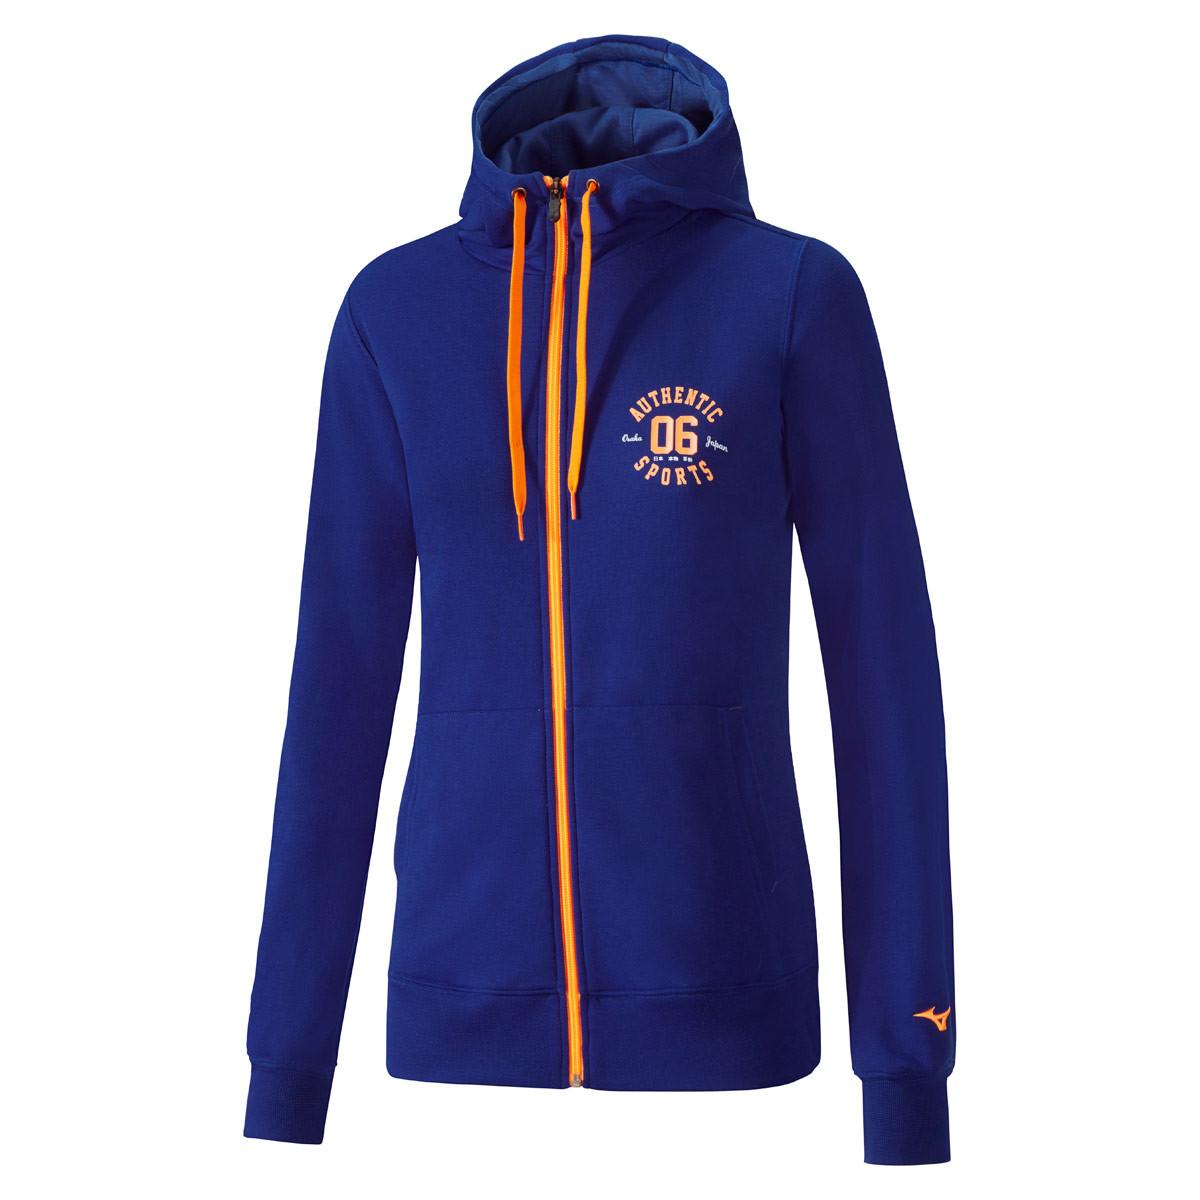 c1a7a7da7ca389 Mizuno Heritage Zip Hoody - Sweatshirts & Hoodies für Damen - Blau | 21RUN